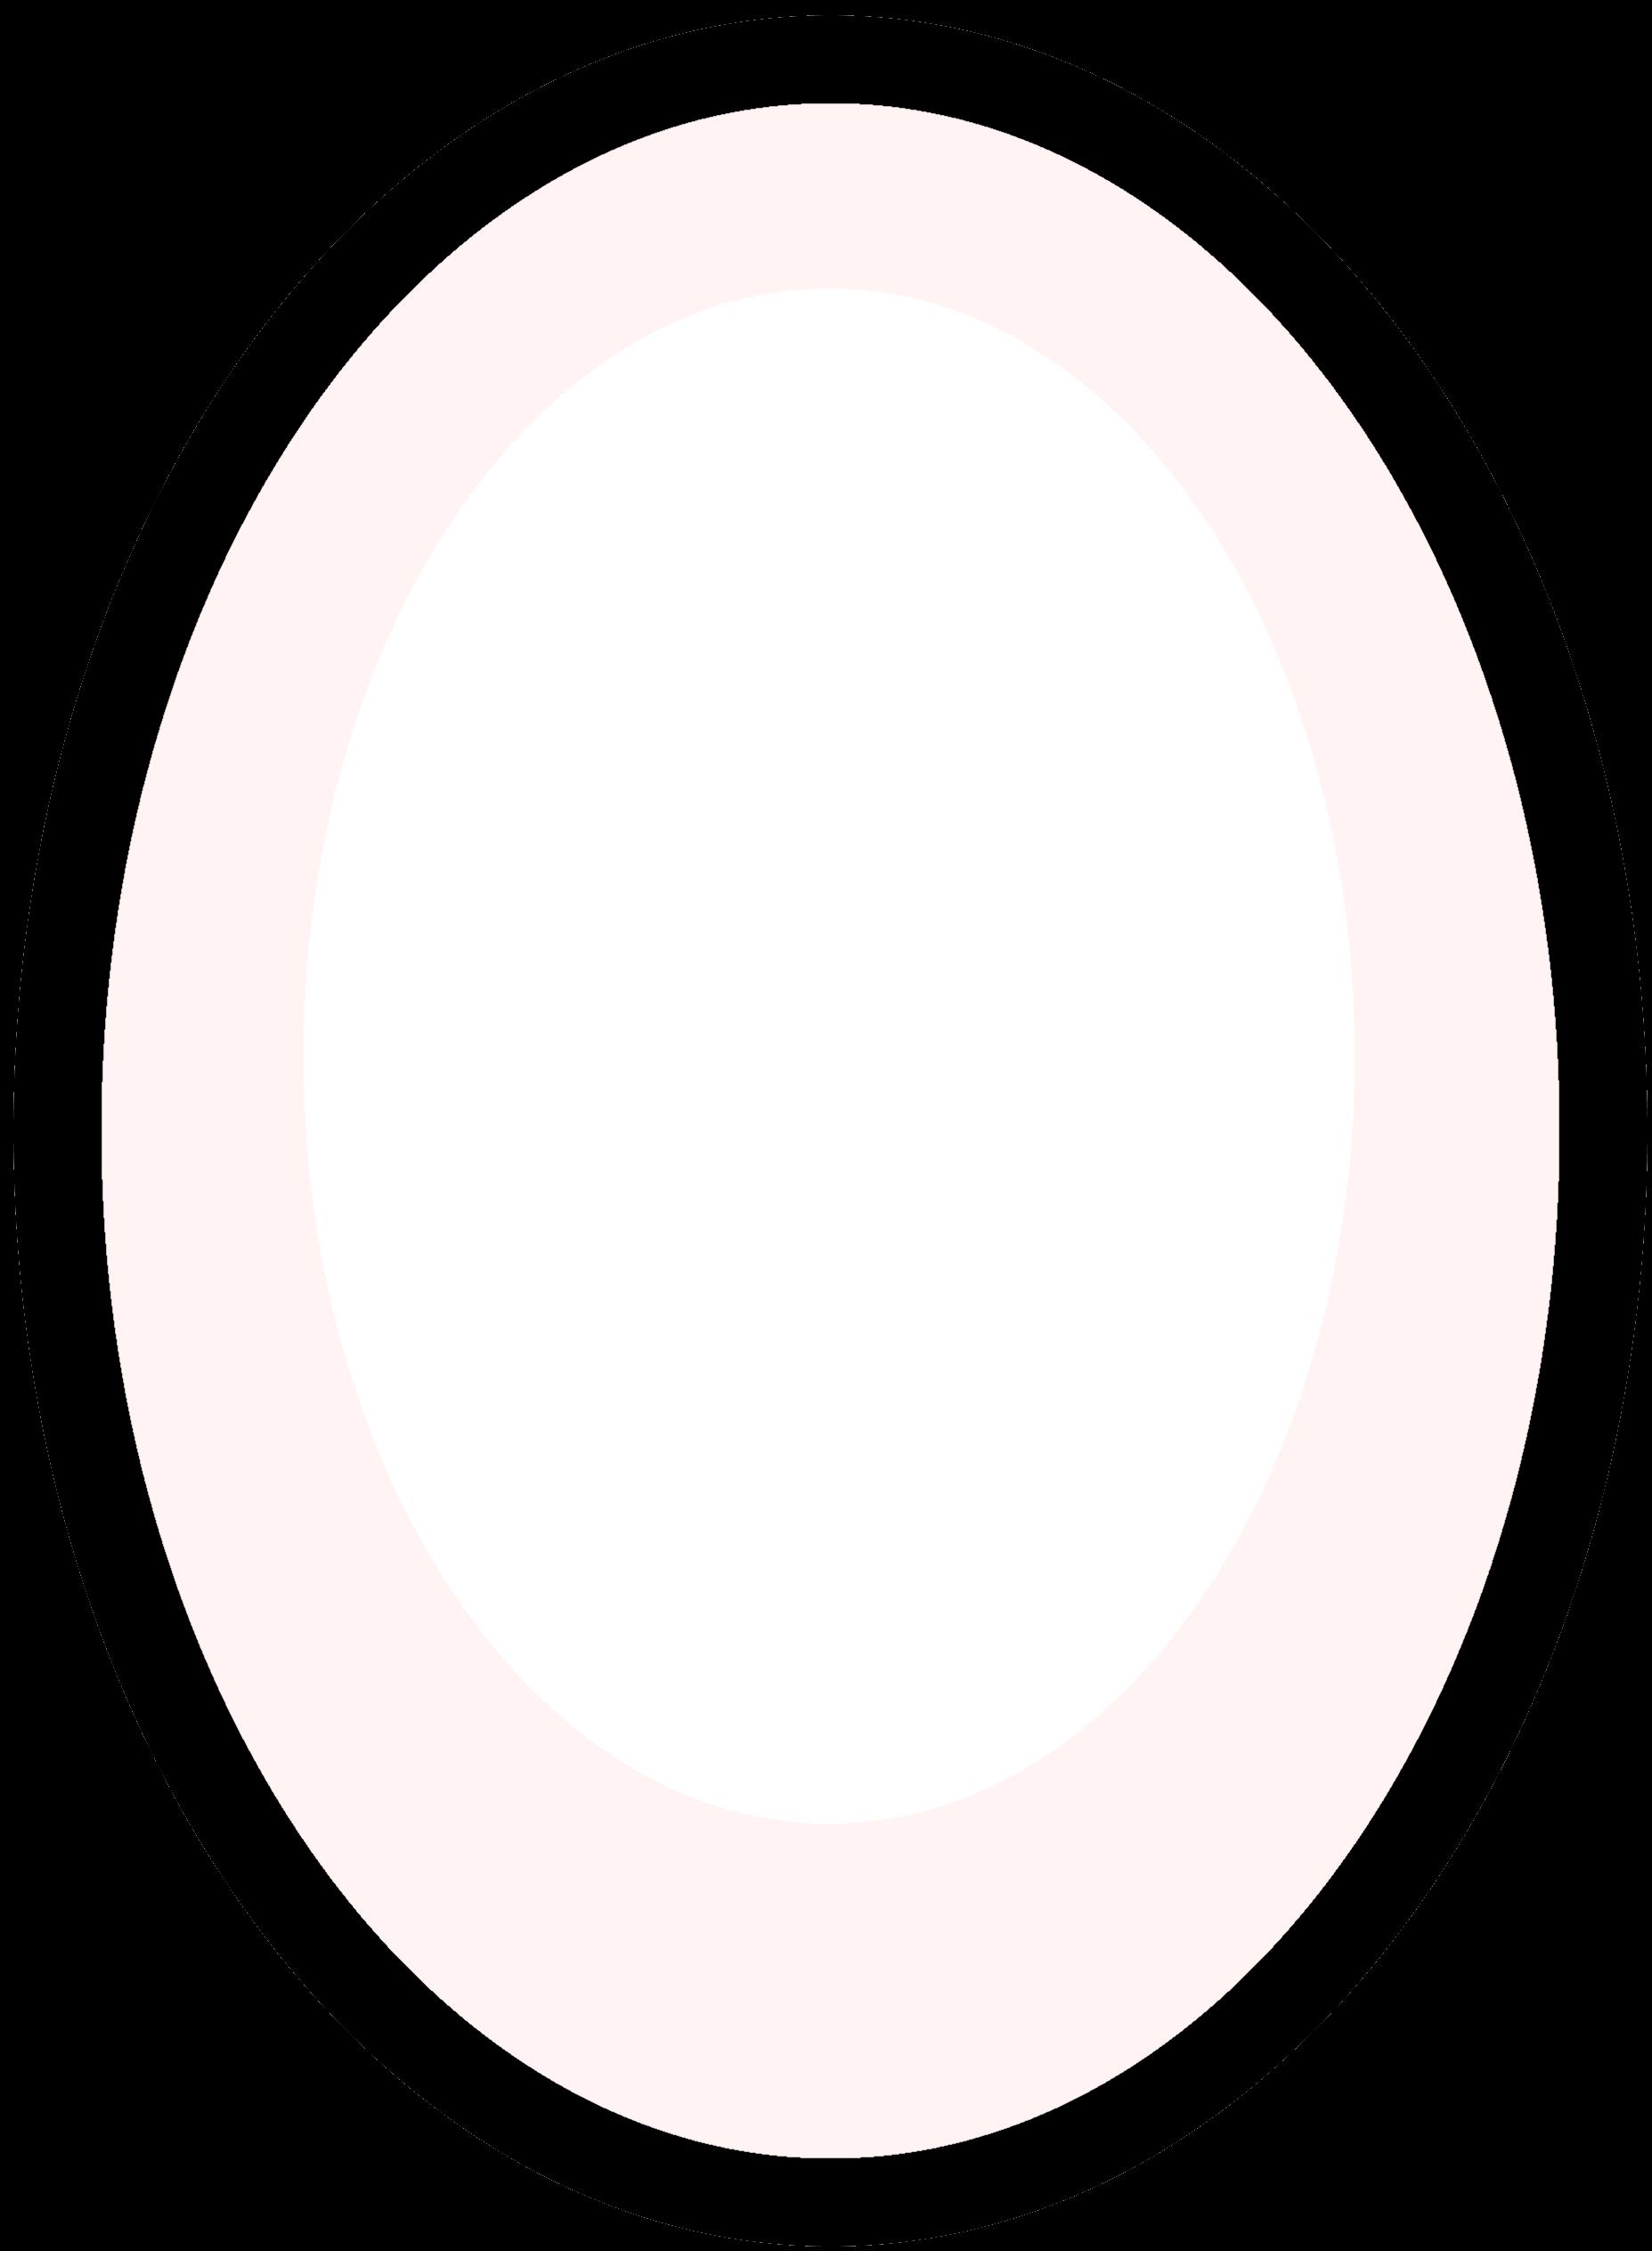 Image pearlgemclear png steven. Gem clipart oval